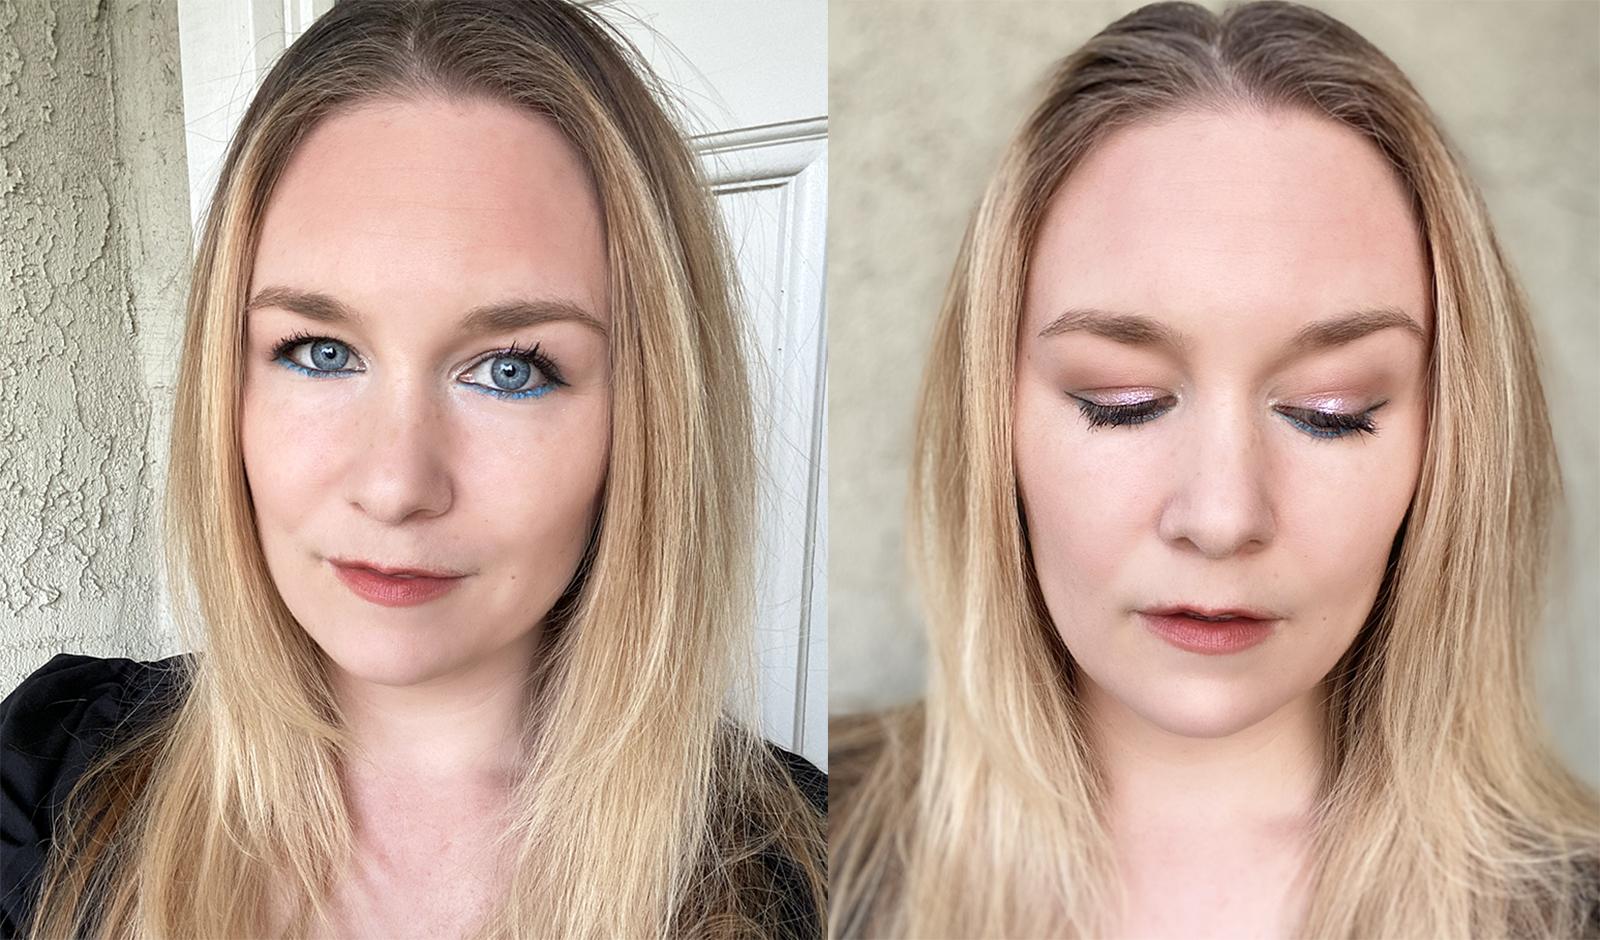 malorie-mackey-summer-makeup-look-main-image